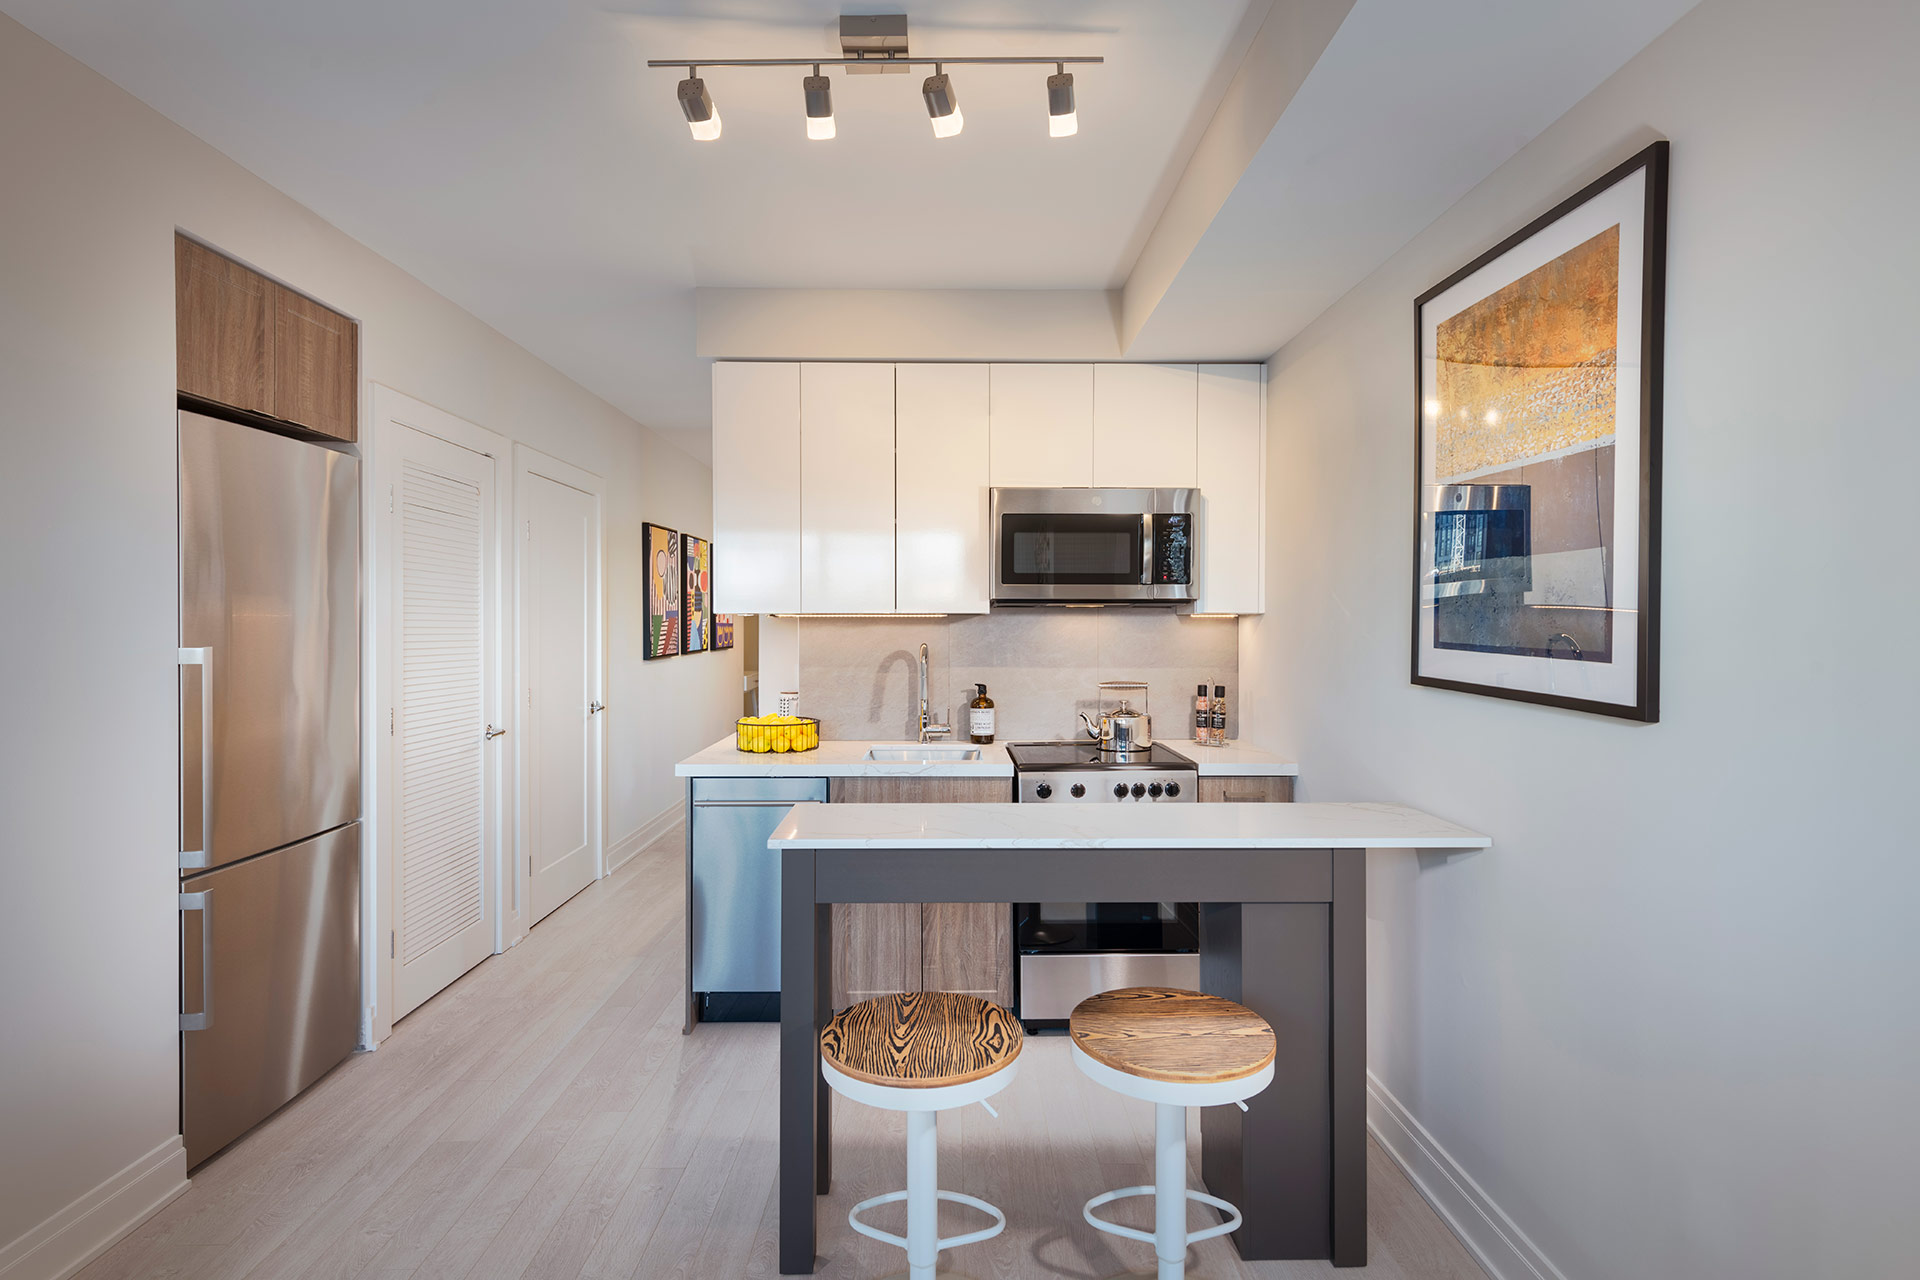 kitchen cabinets range microwave dishwasher